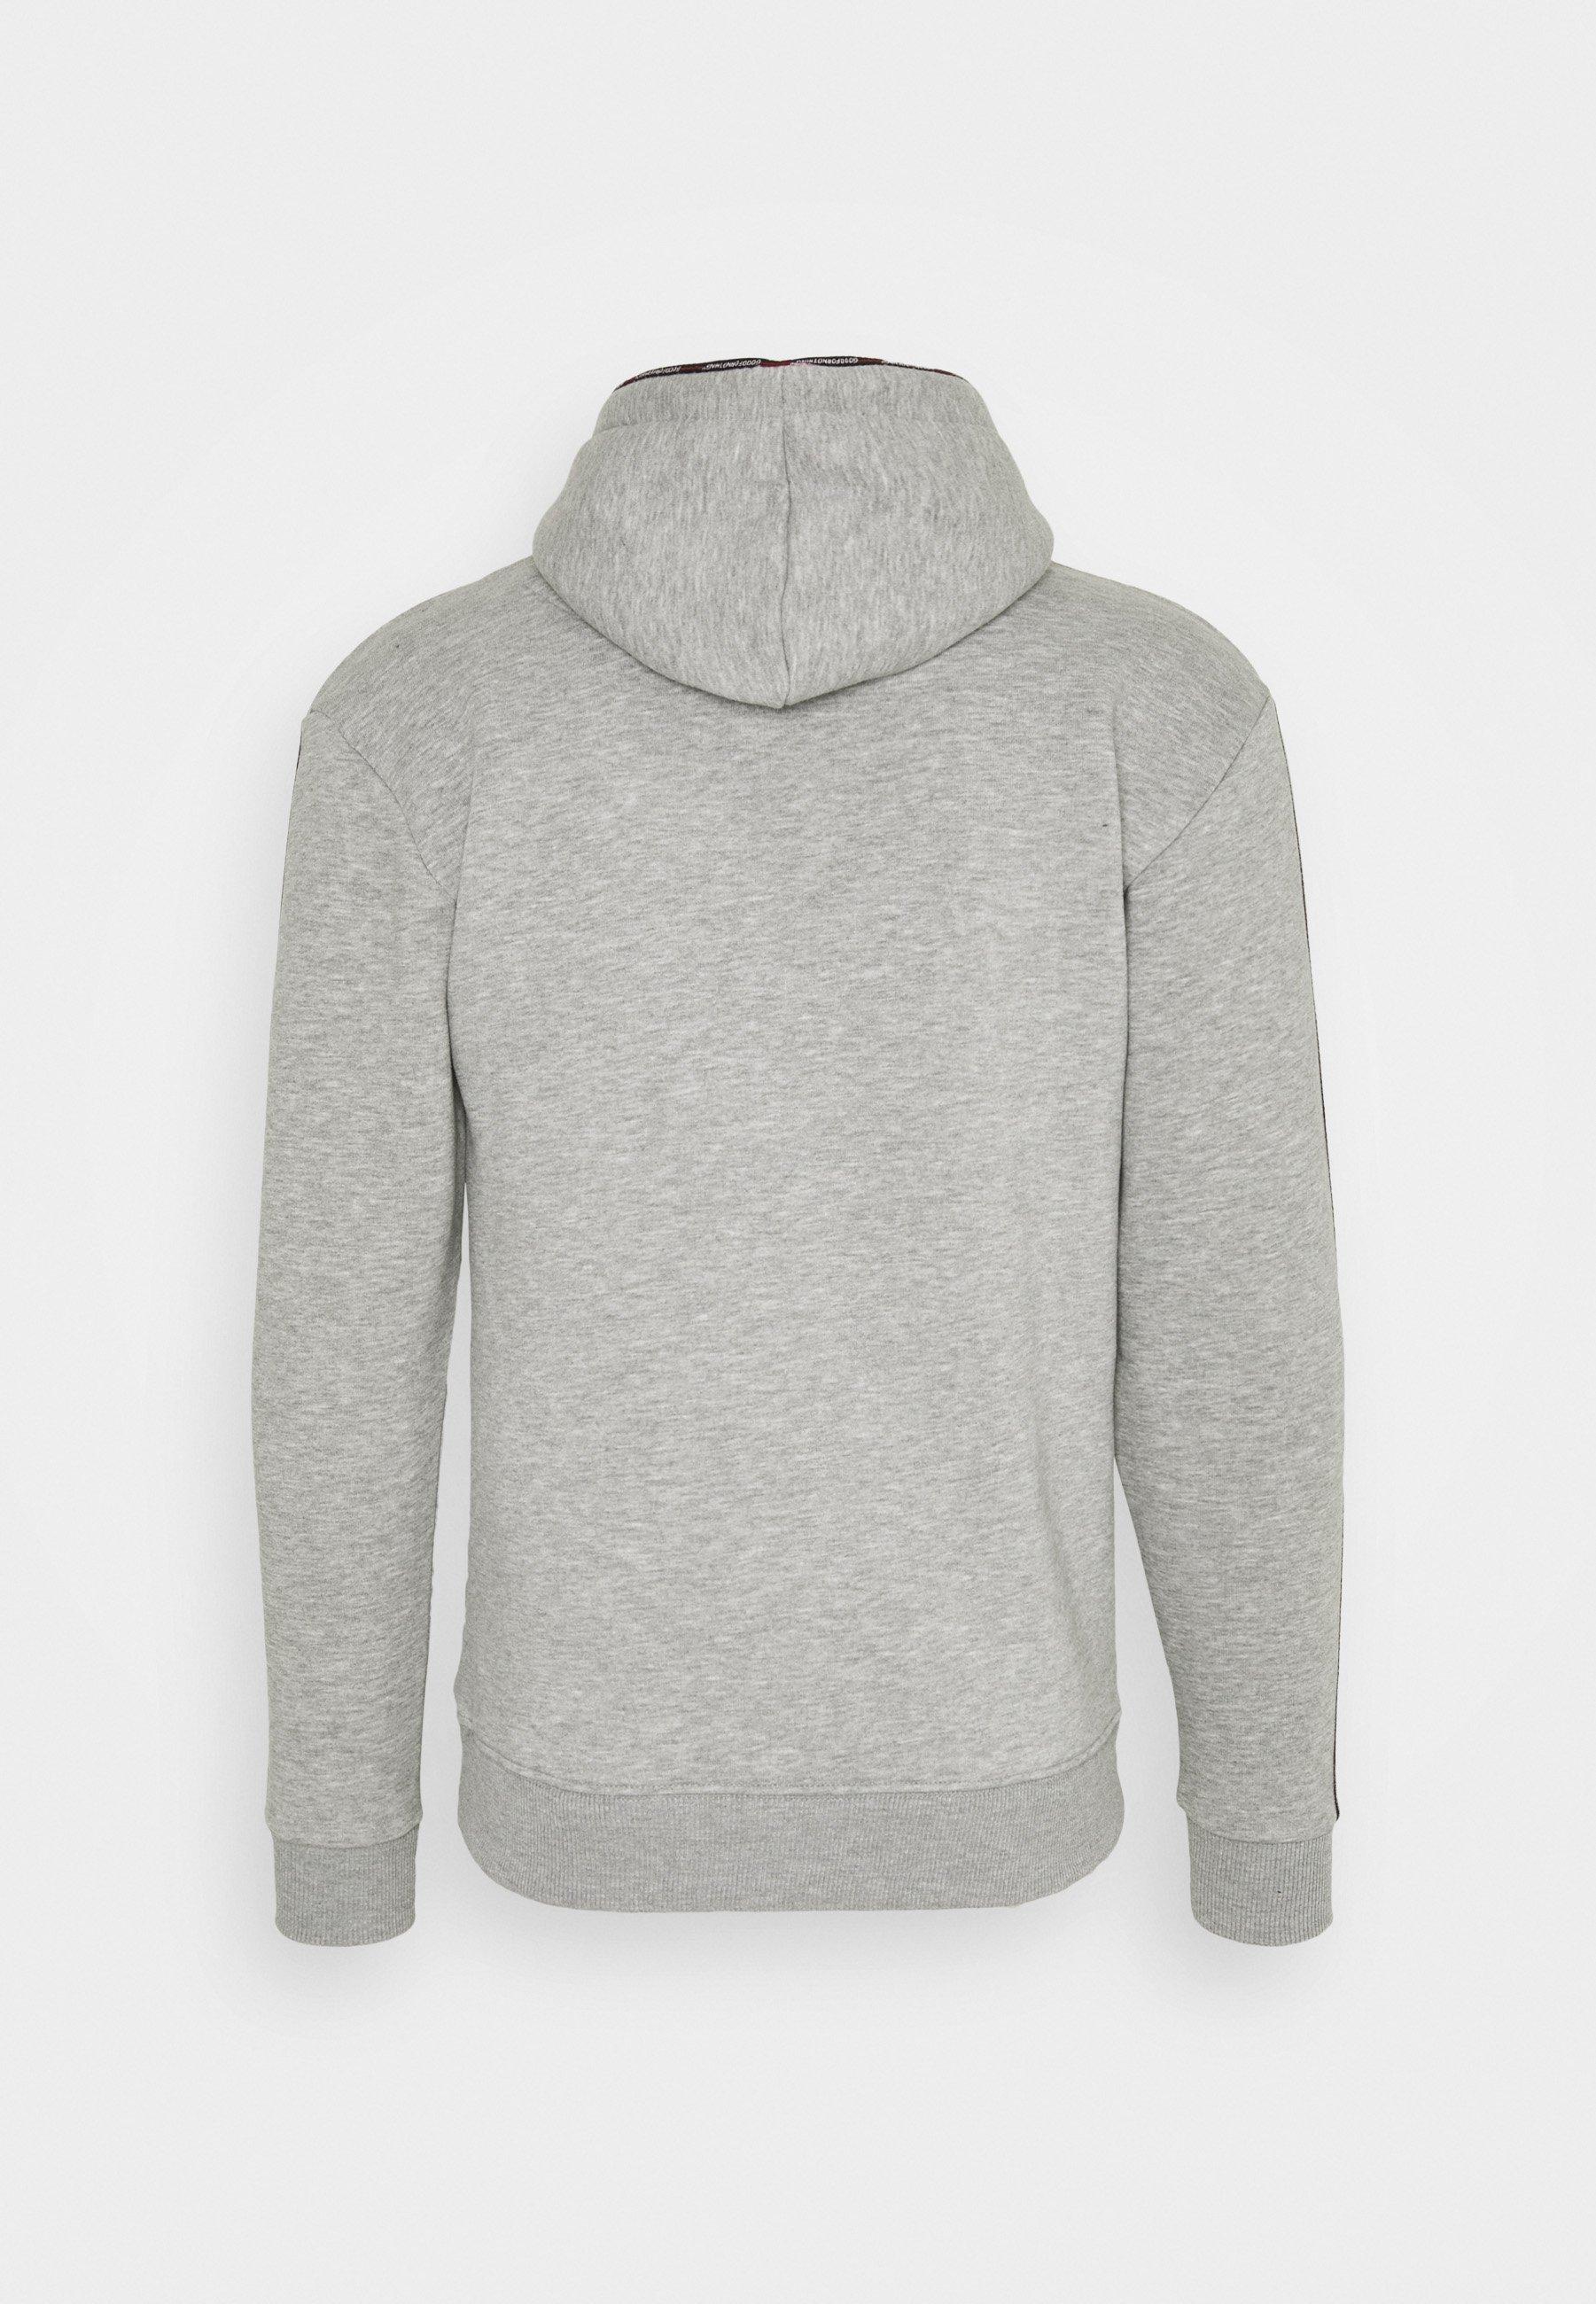 Homme FITTED GREY MICRO TAPED BRANDED HOOD - Sweatshirt